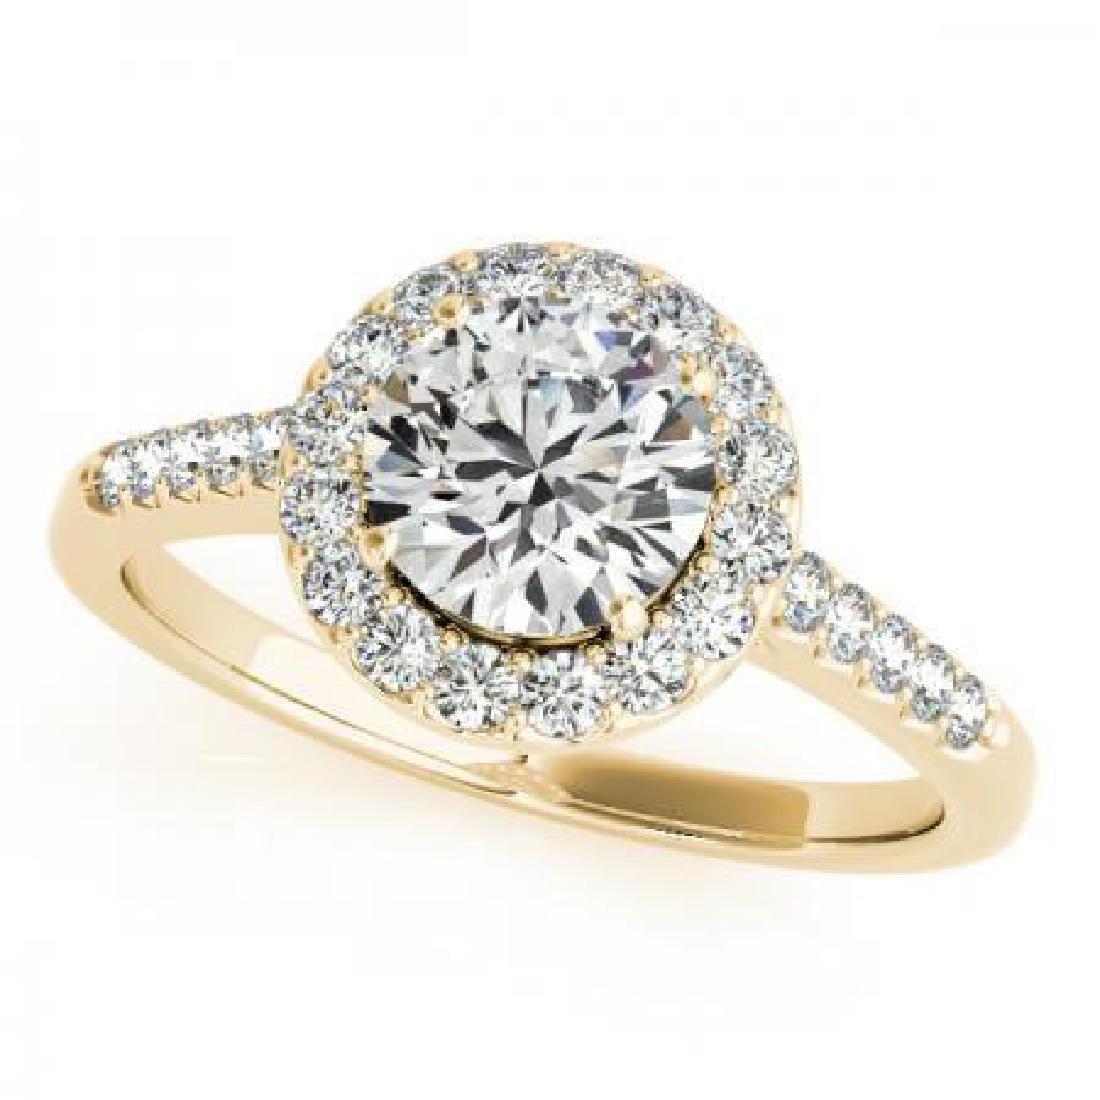 CERTIFIED 18K YELLOW GOLD 1.22 CT G-H/VS-SI1 DIAMOND HA